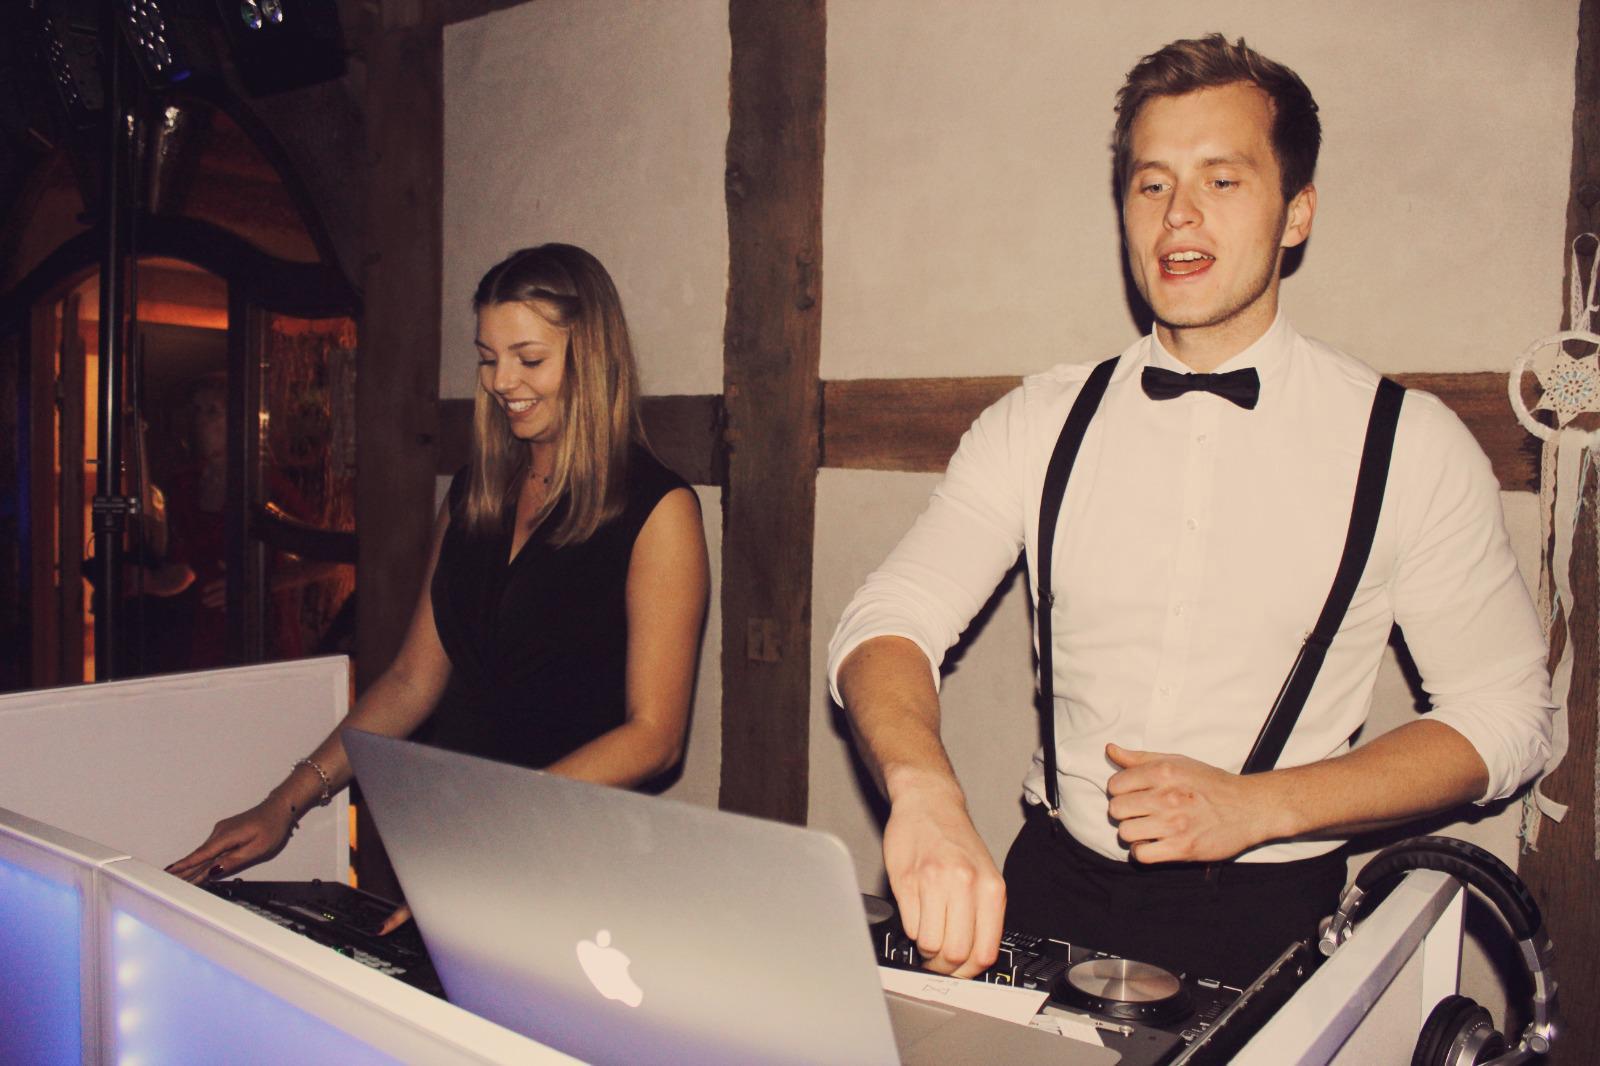 Hochzeit-DJ-Osnabrück-Julian-Hügelmeyer